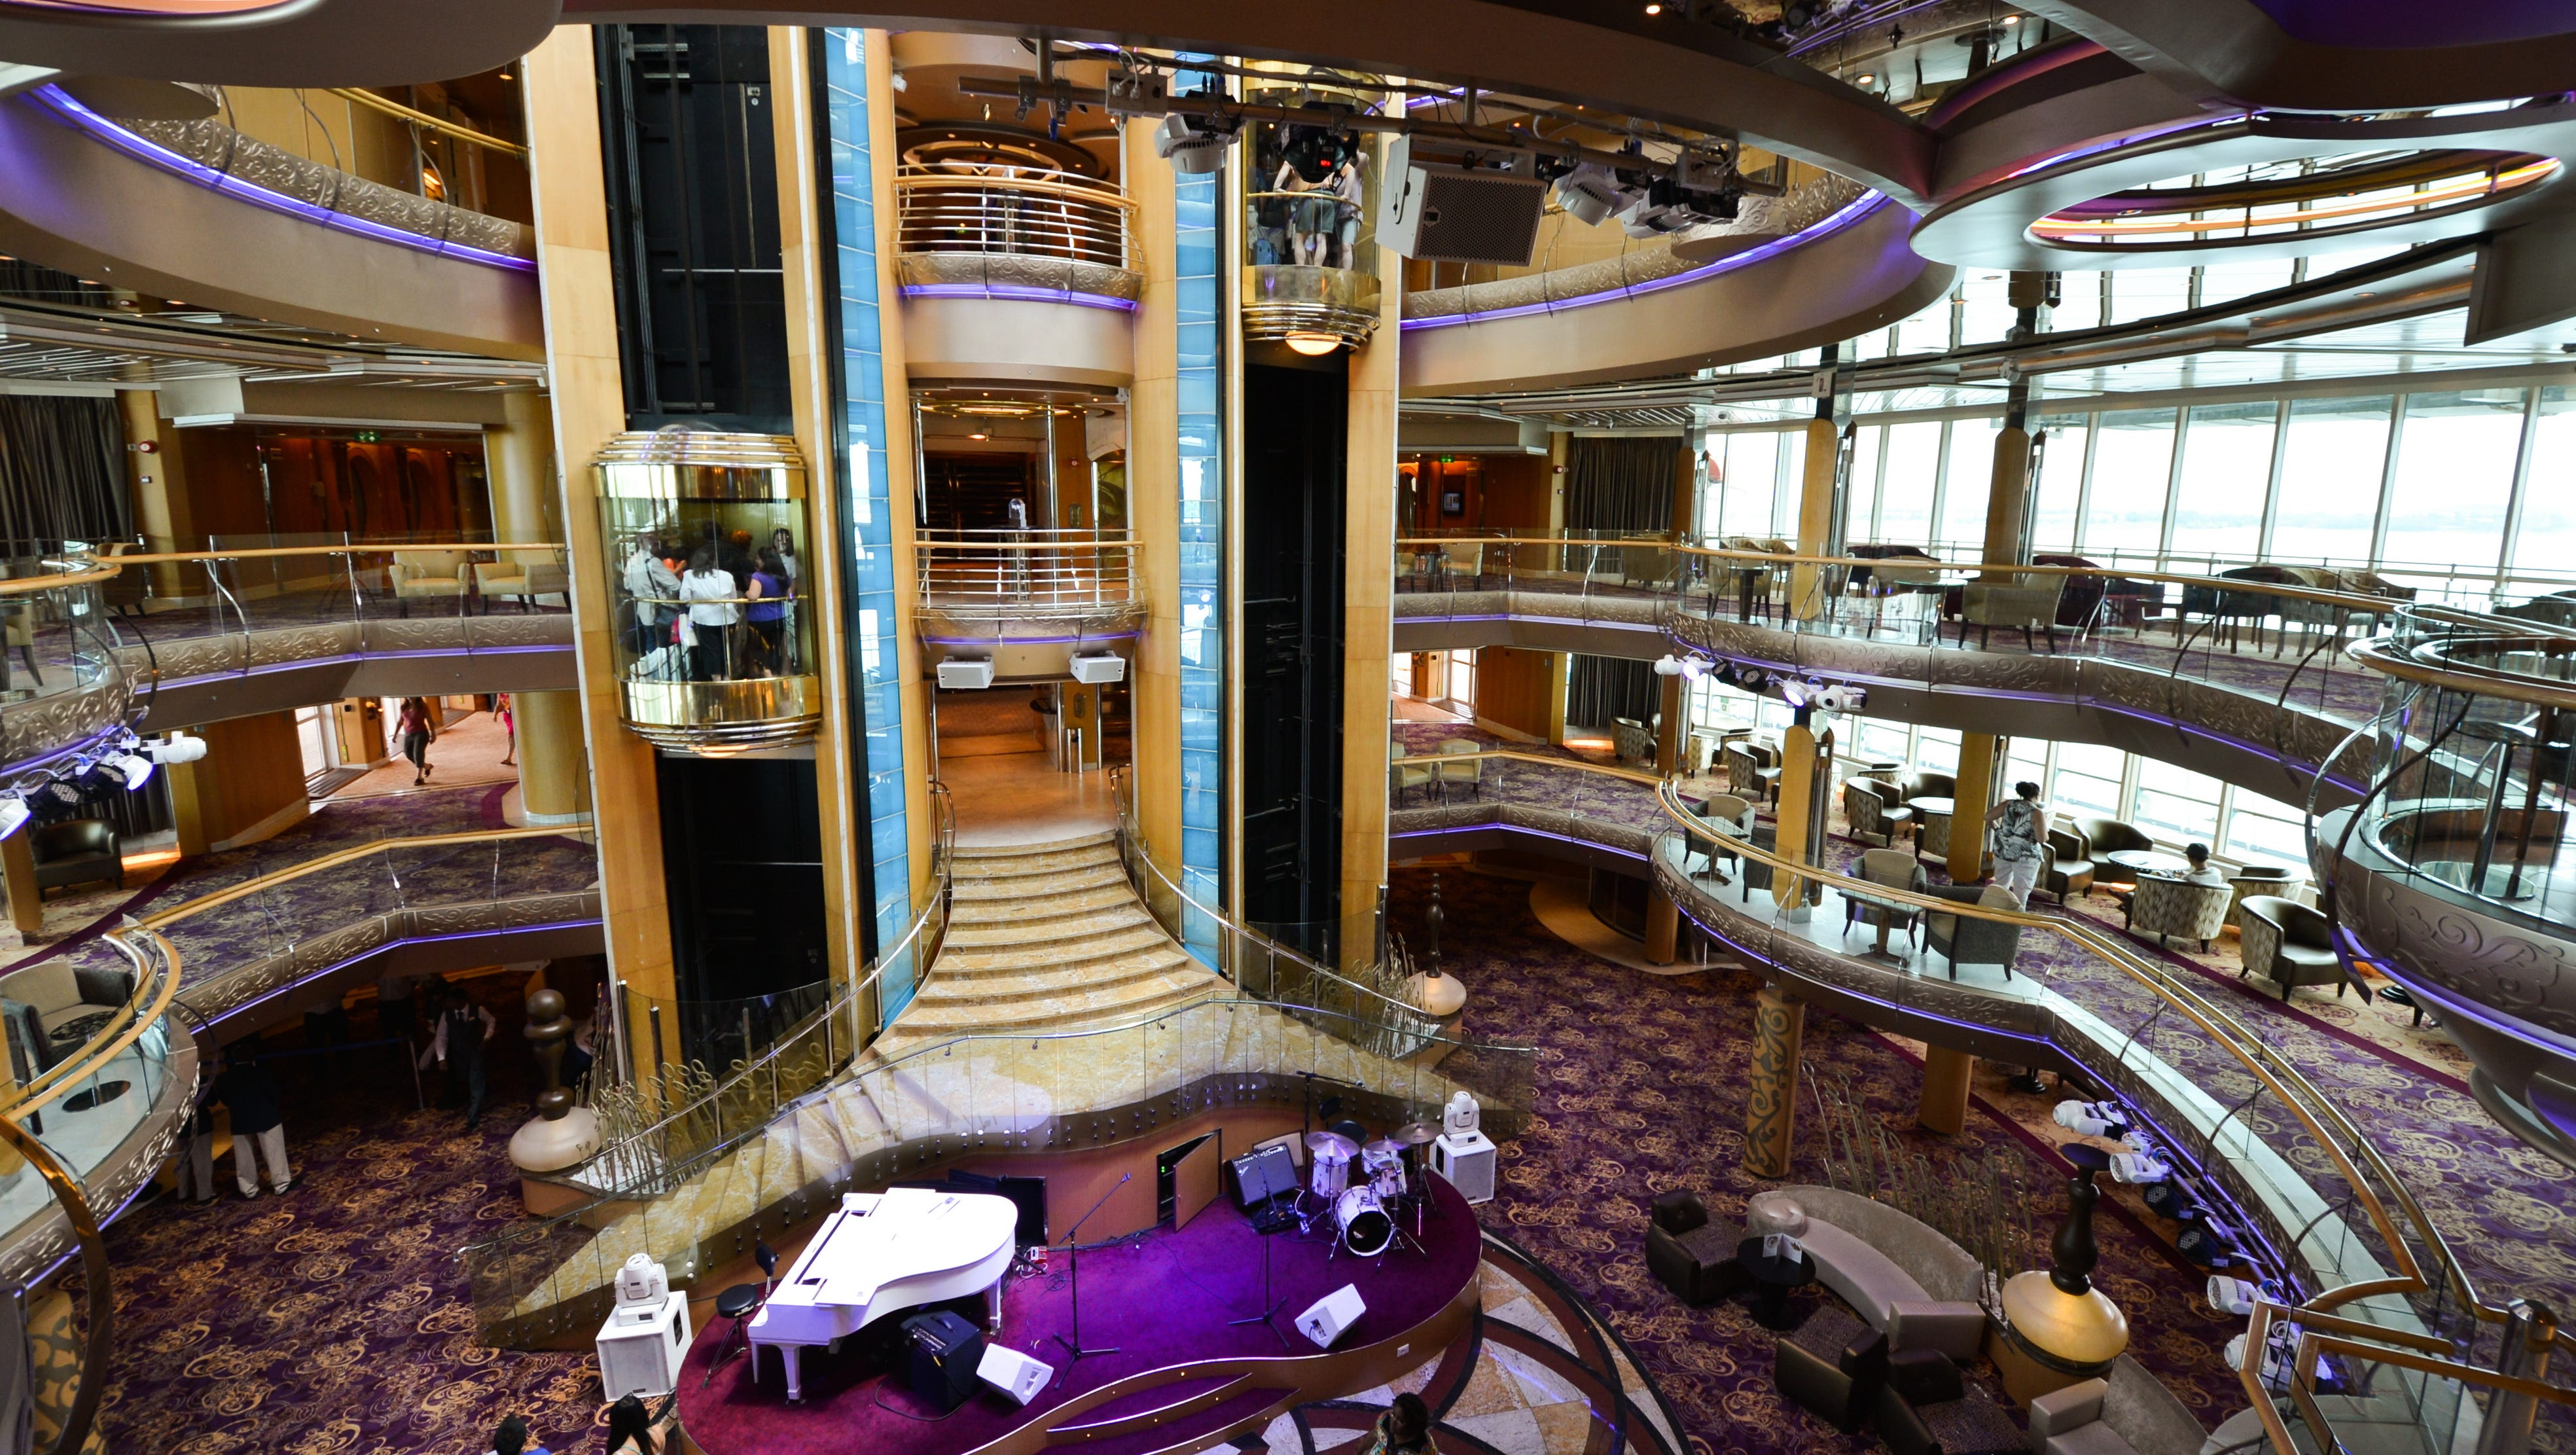 The hub of Grandeur of the Seas' interior is the Centrum, a six-story atrium.